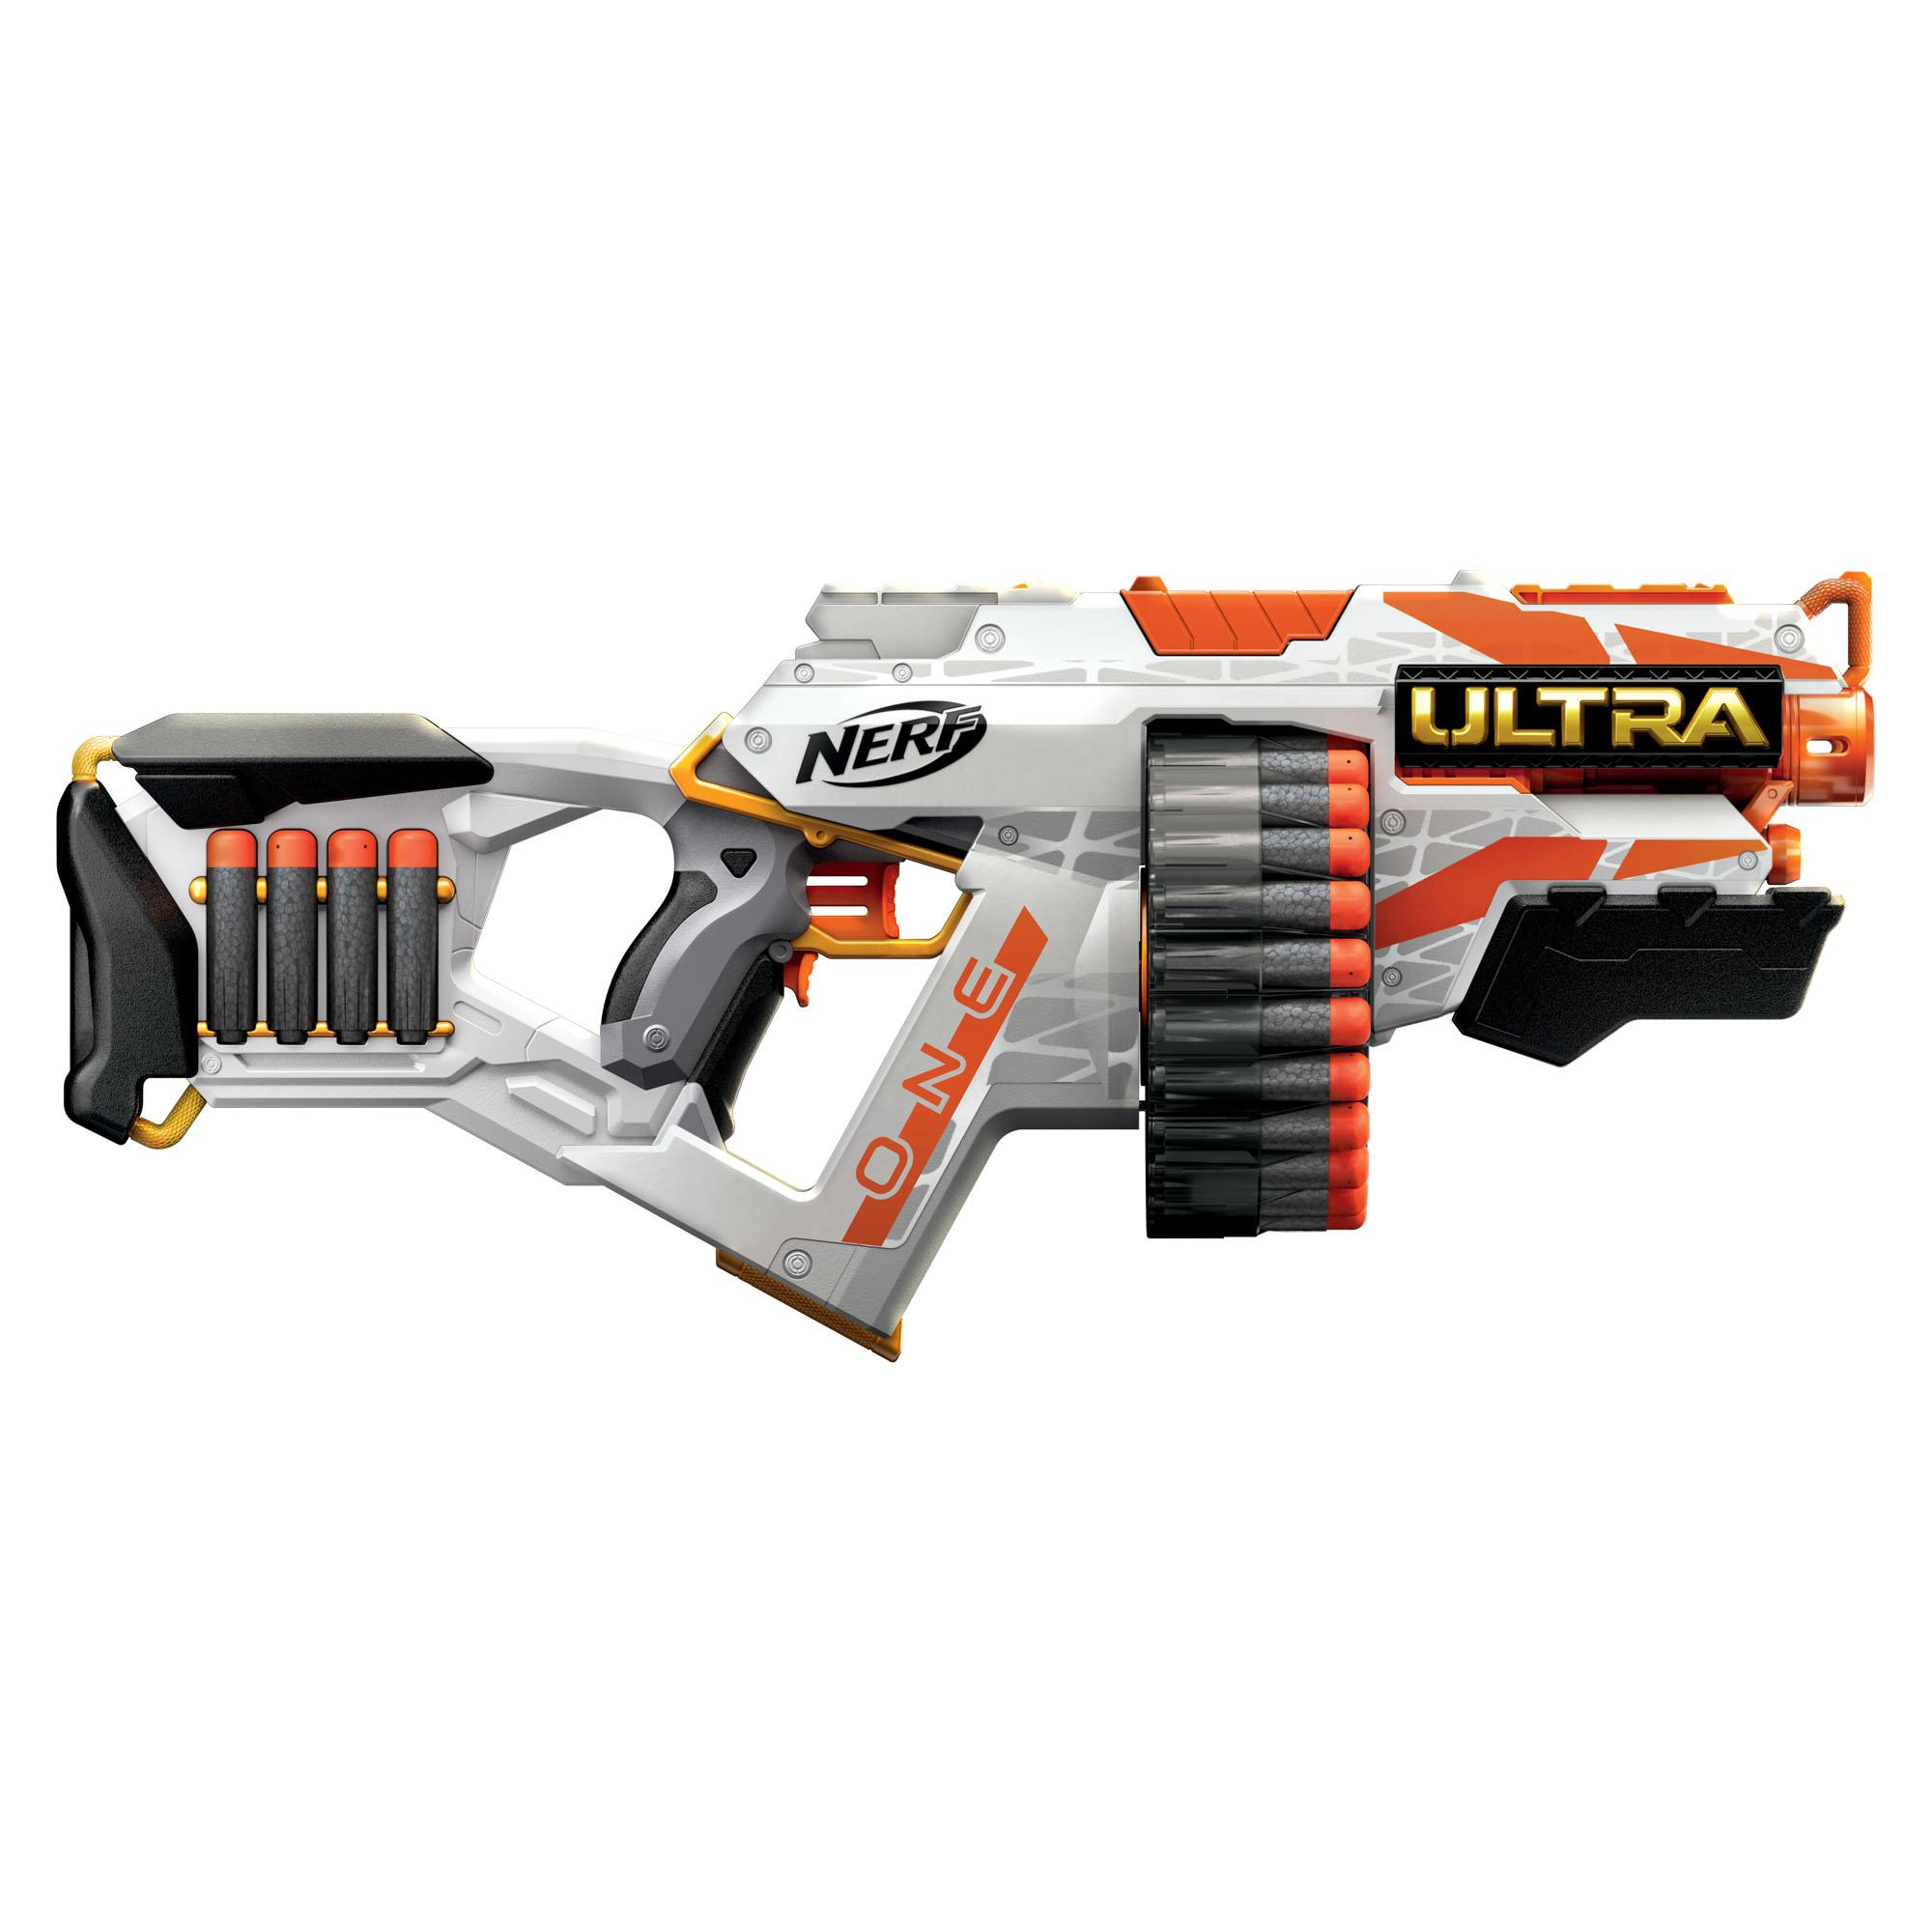 Nerf Ultra One-blaster